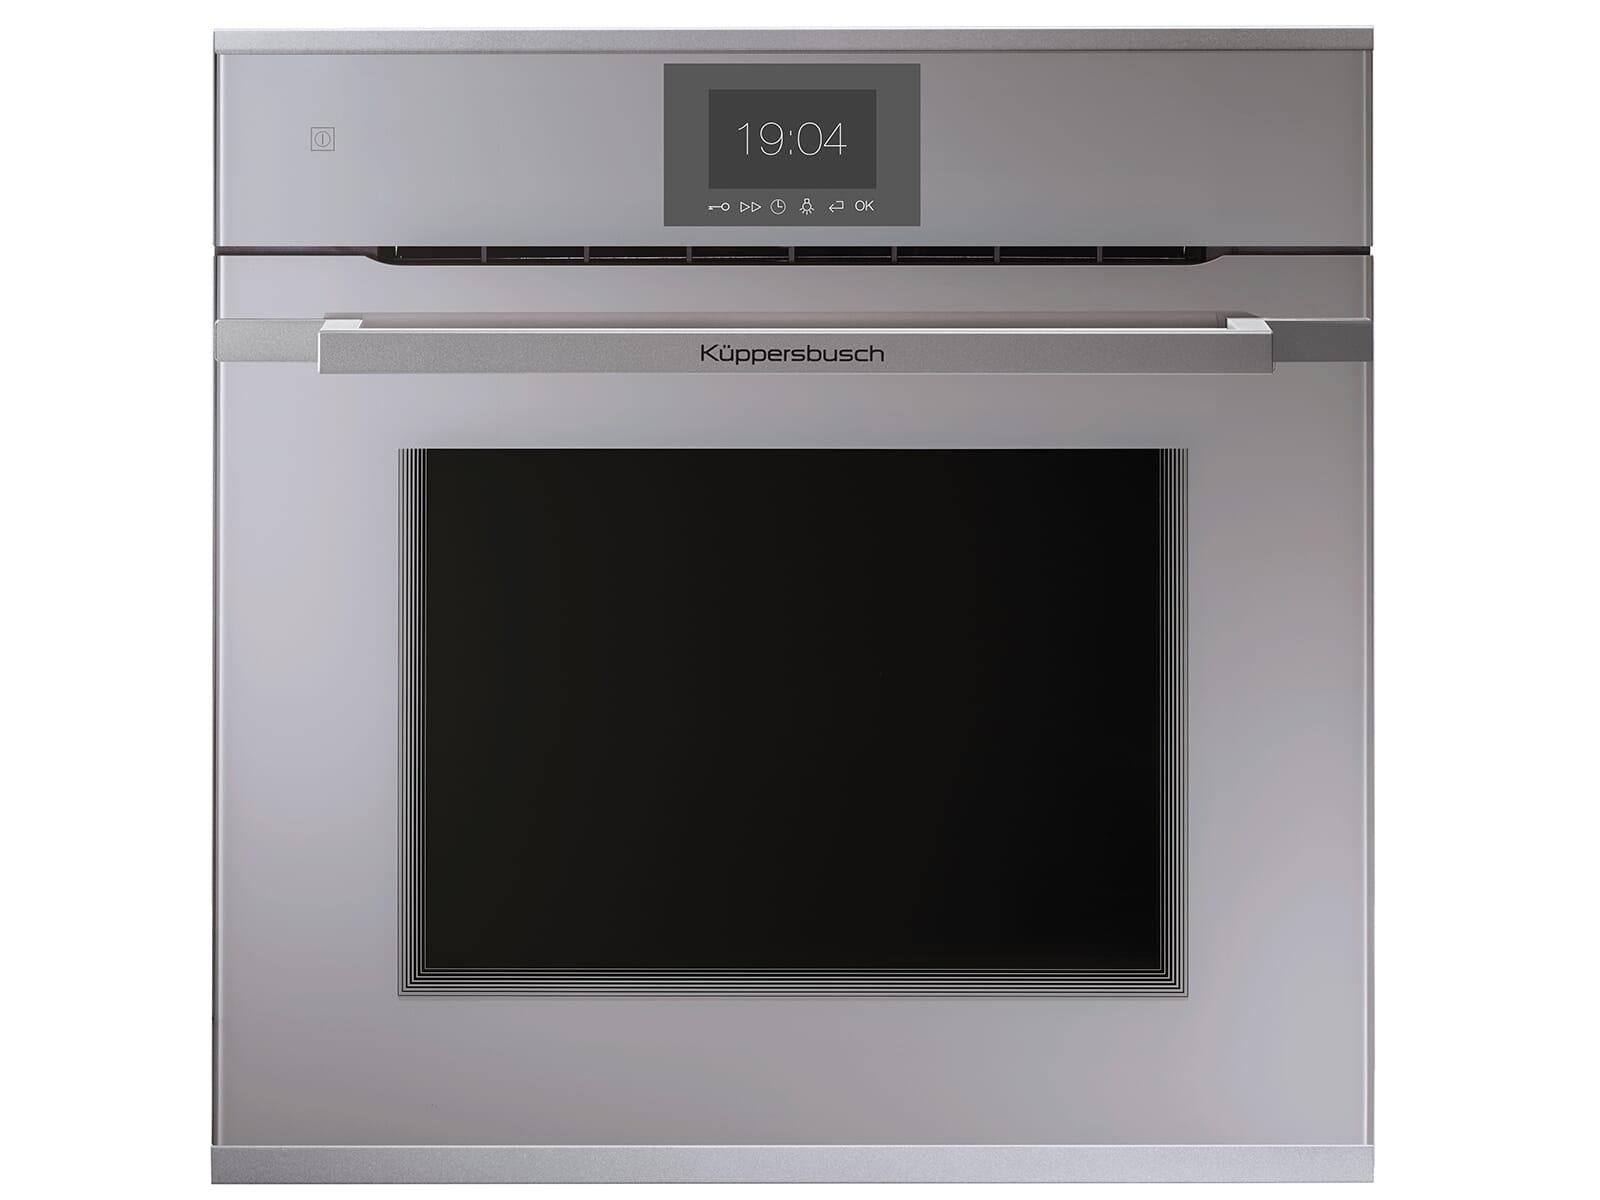 Küppersbusch B 6550.0 G9 K-Series.5 Backofen Shade of Grey